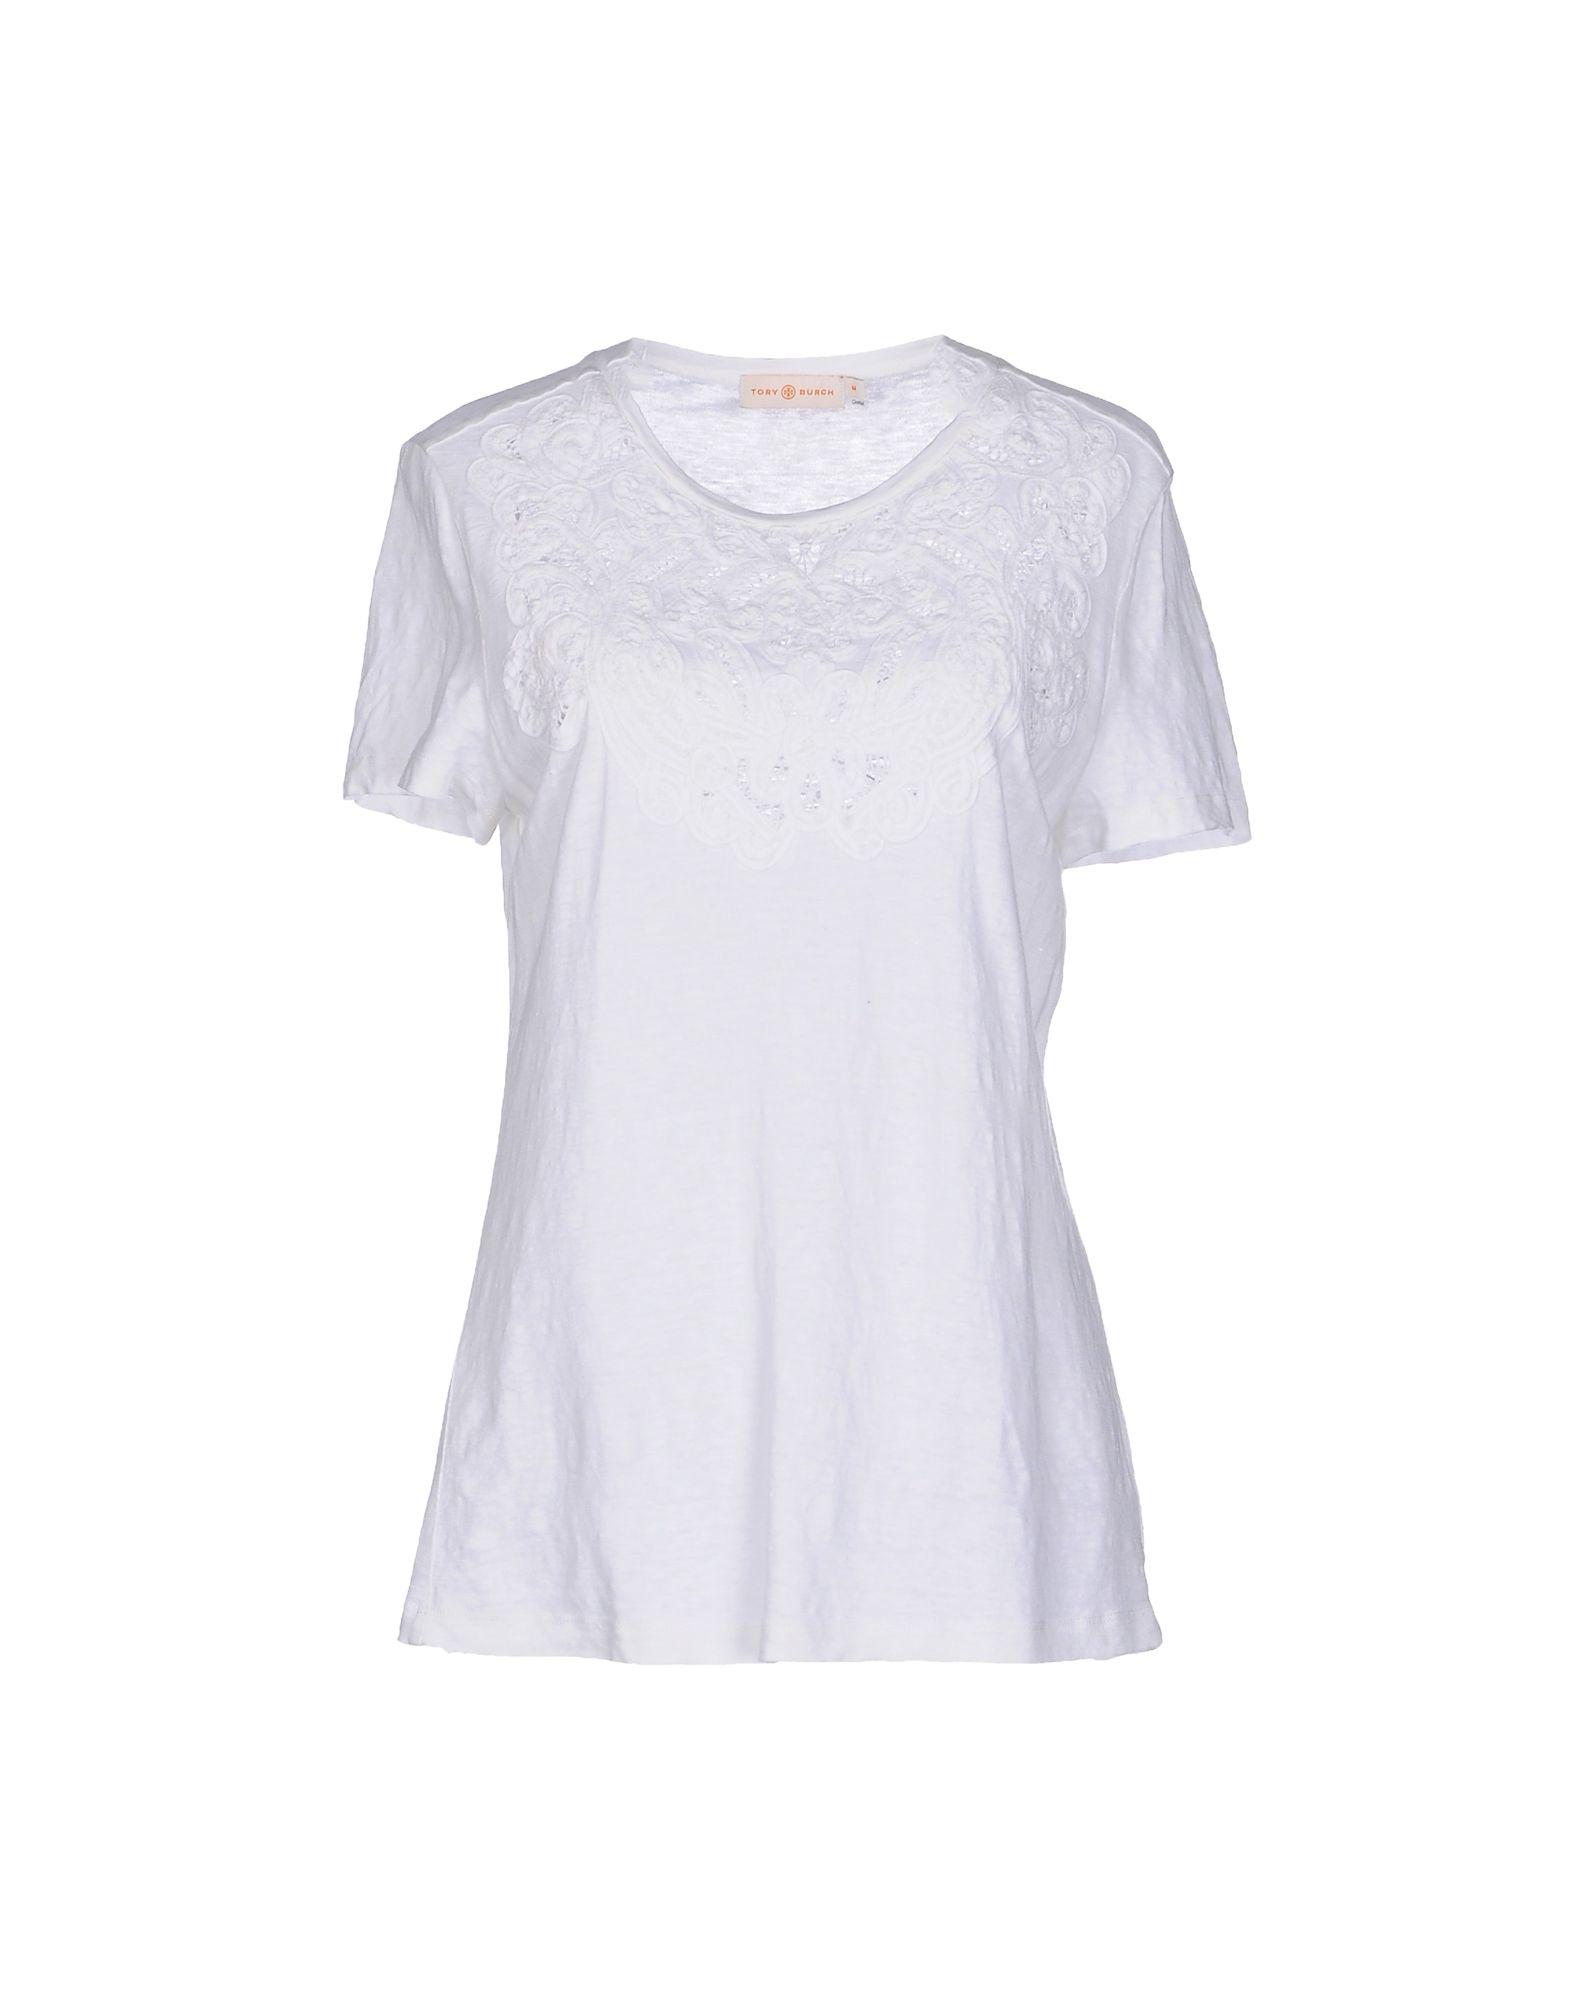 Lyst tory burch t shirt in white for Tory burch t shirt